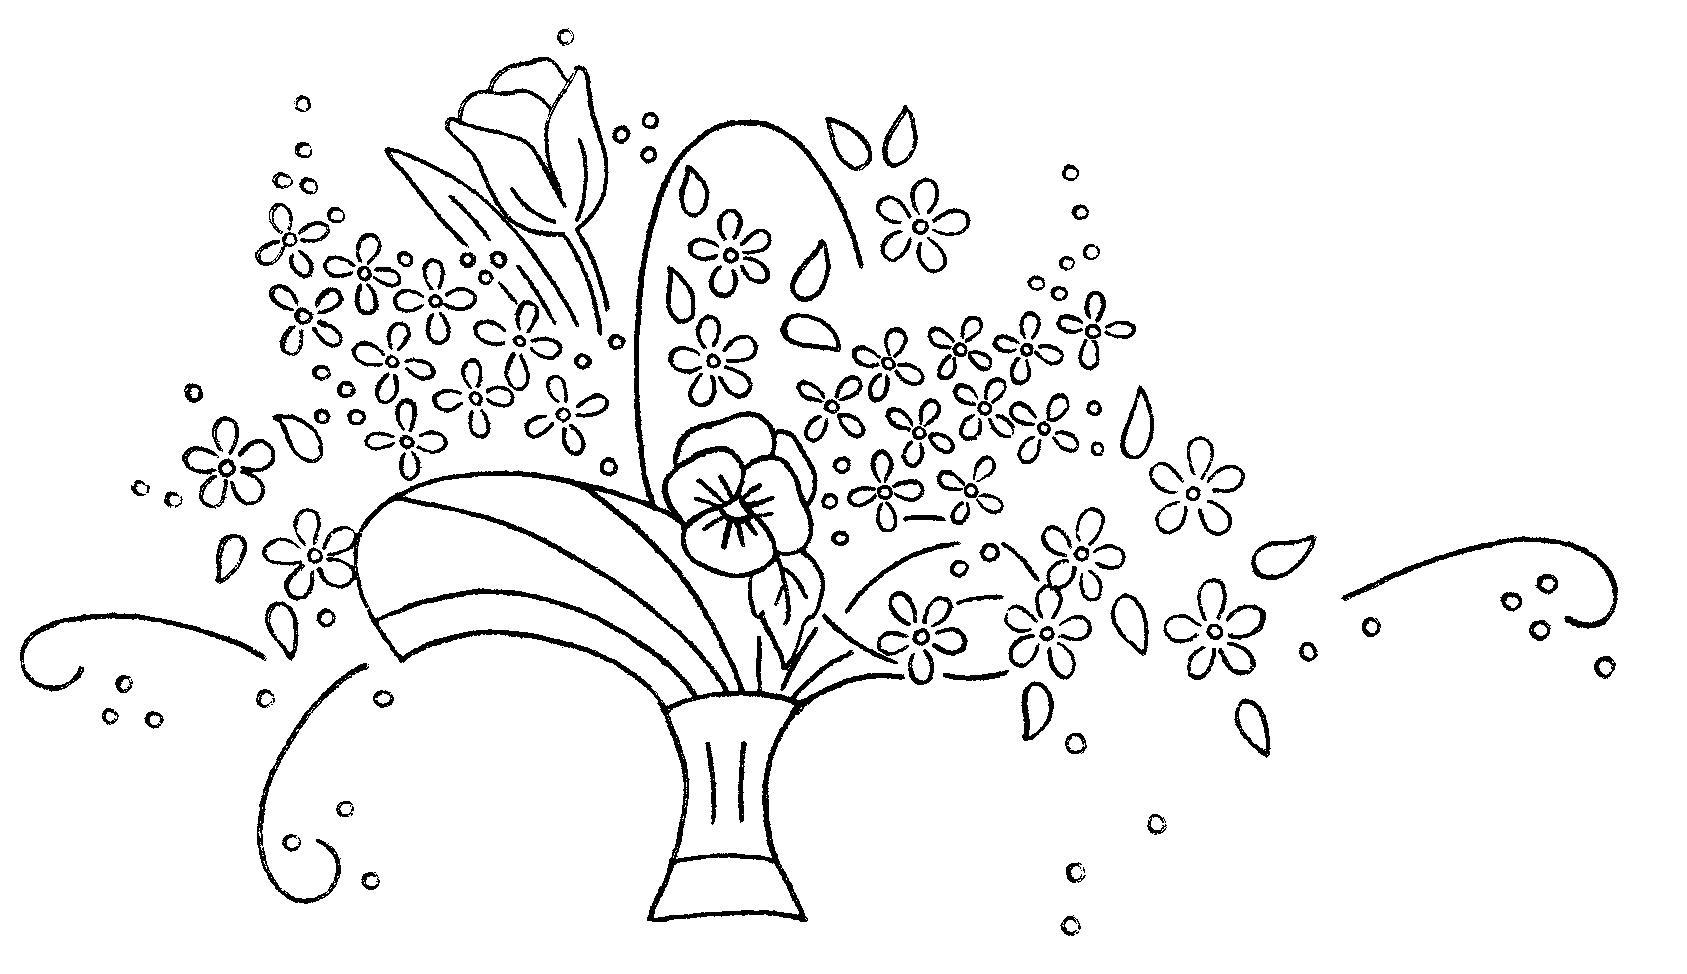 86 WB flowers 2 4